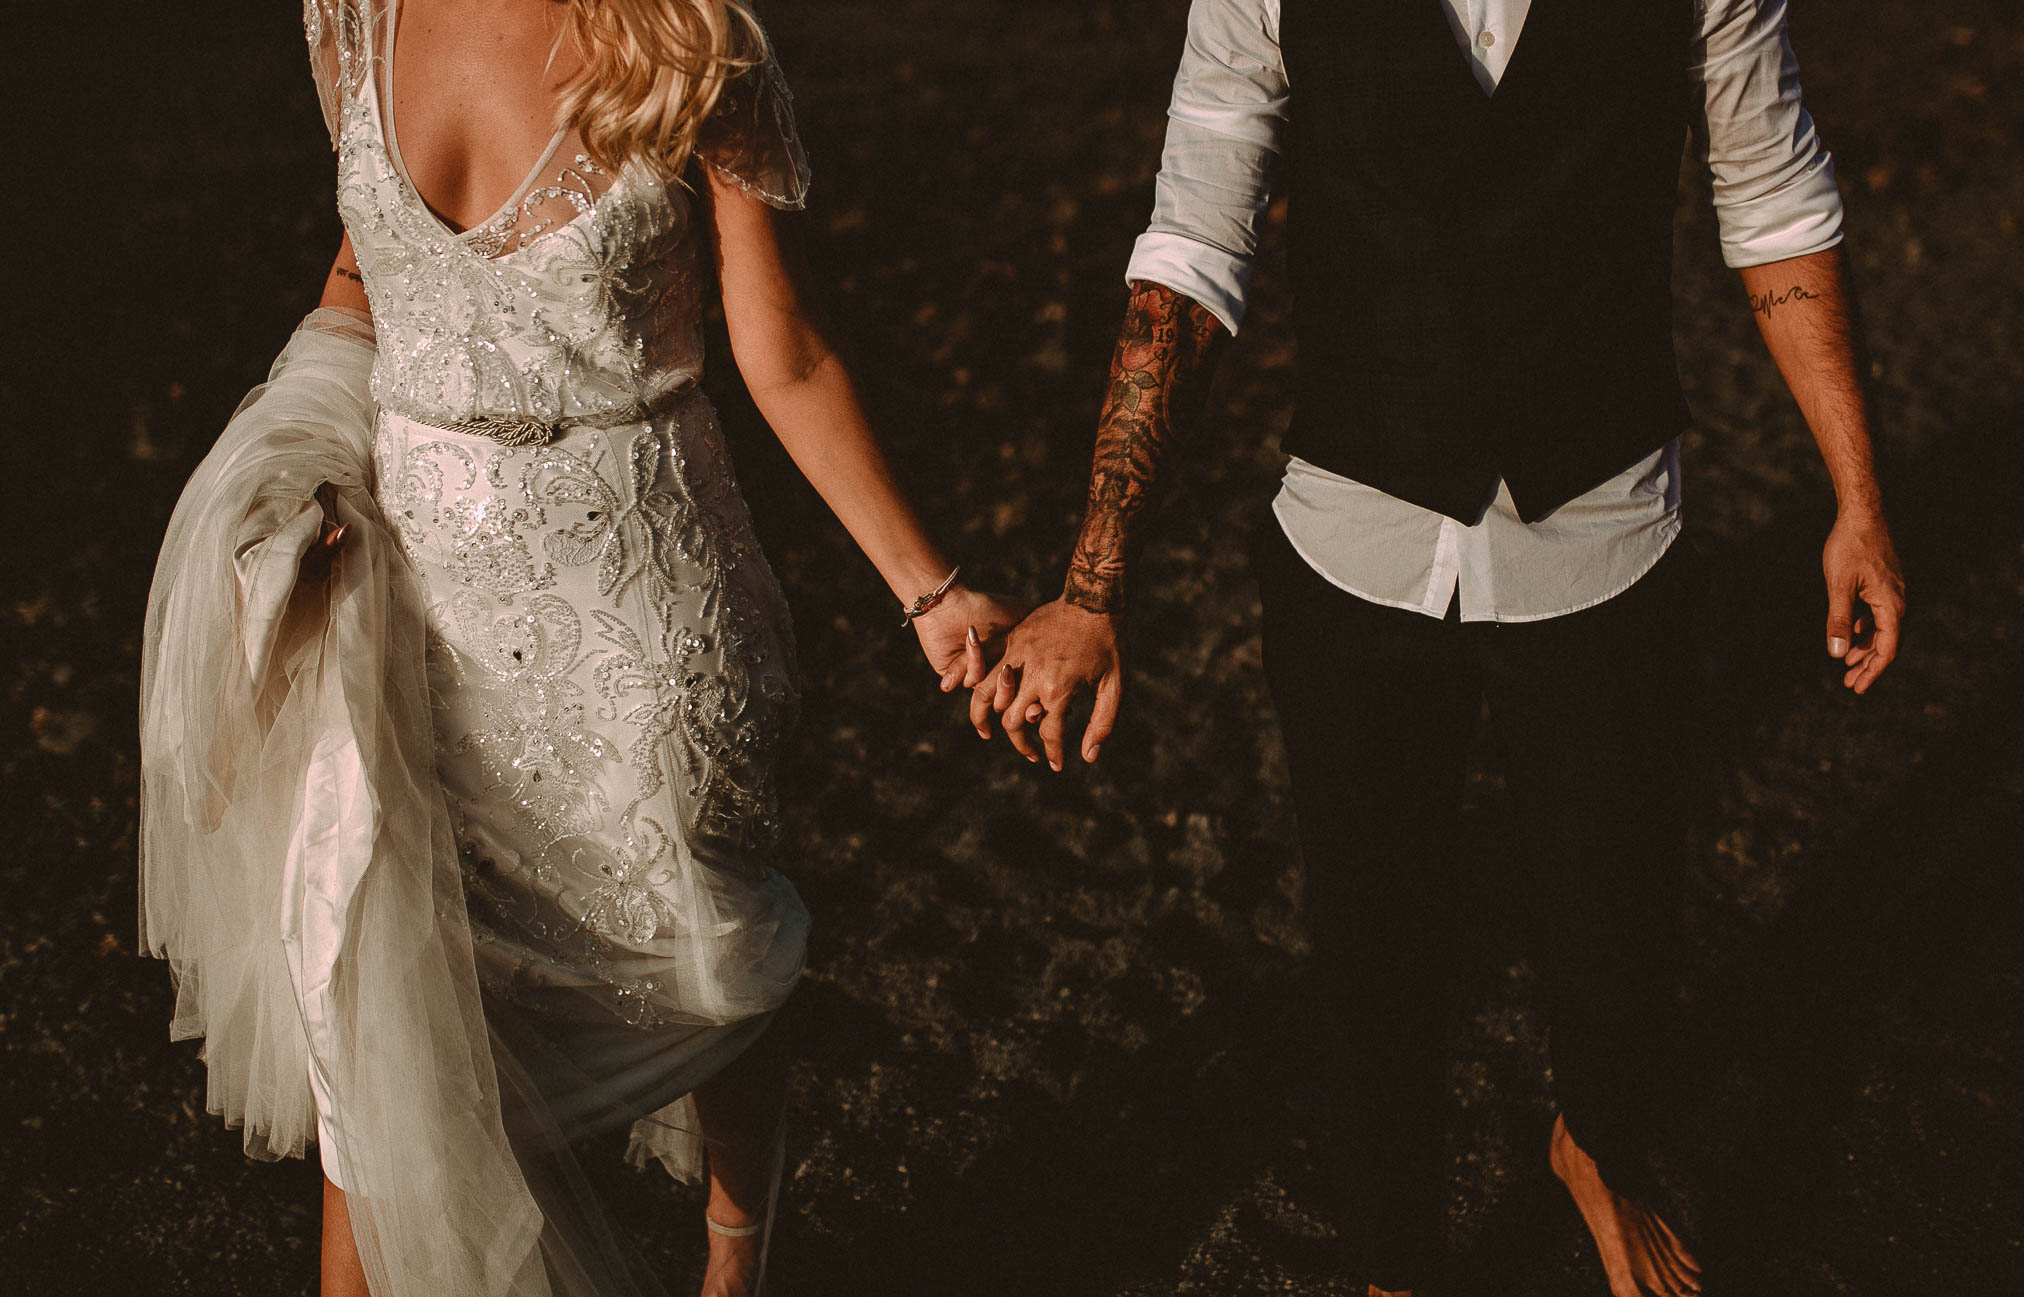 Lanzarote_Wedding_Photographer_9879